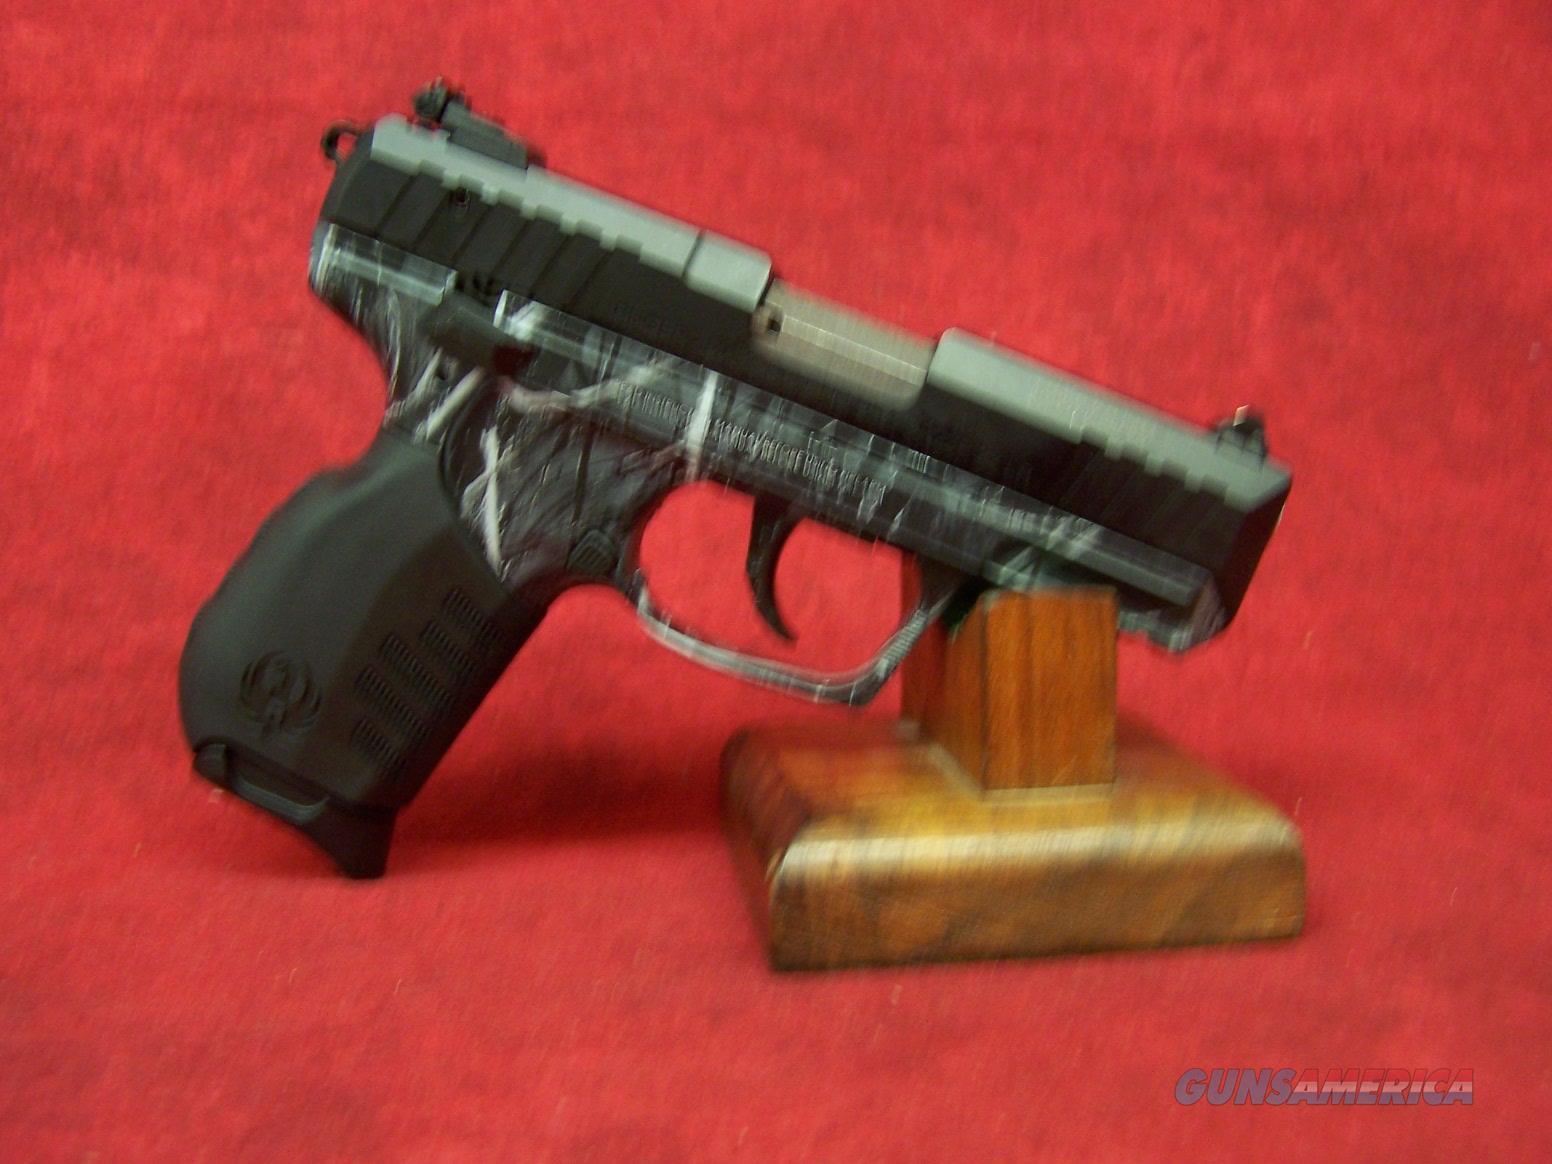 "RUGER SR22 .22LR 3.5"" BARREL MOONSHINE CAMO HARVEST MOON (03637)  Guns > Pistols > Ruger Semi-Auto Pistols > SR Family > SR22"